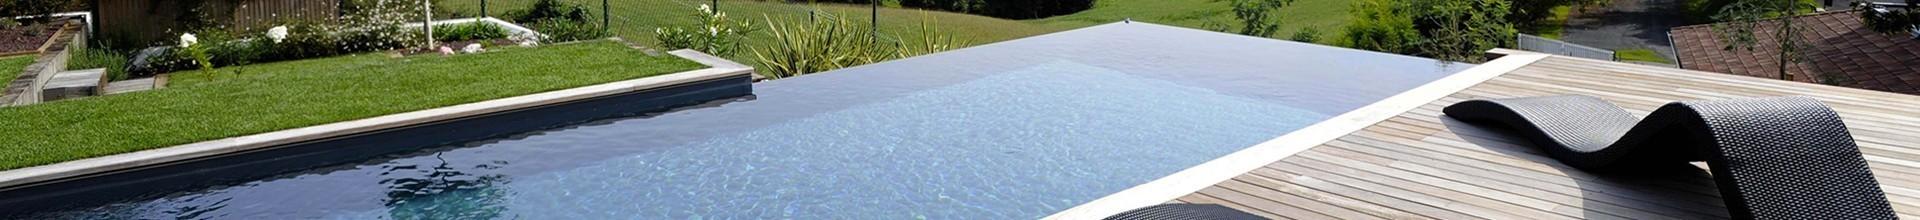 Direct usine, piscine coque prix Tarn